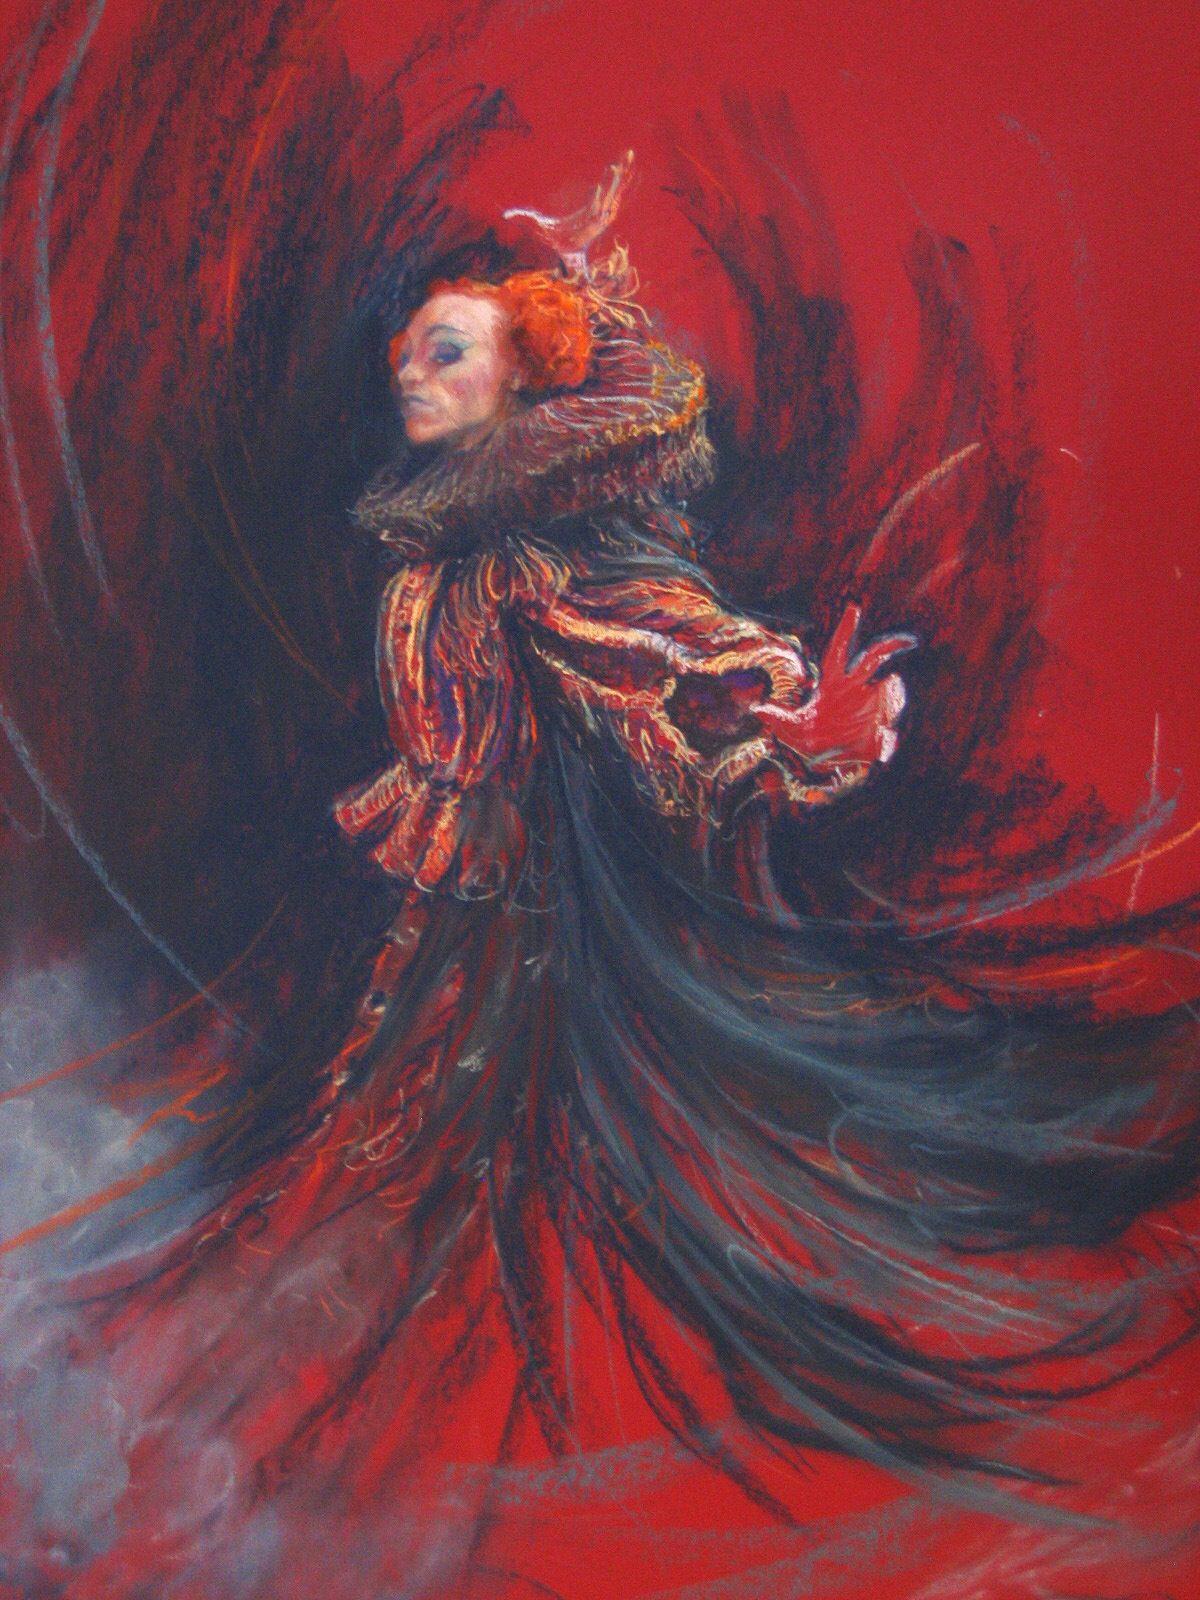 Rebecca de mendonca carabosse painting pastel